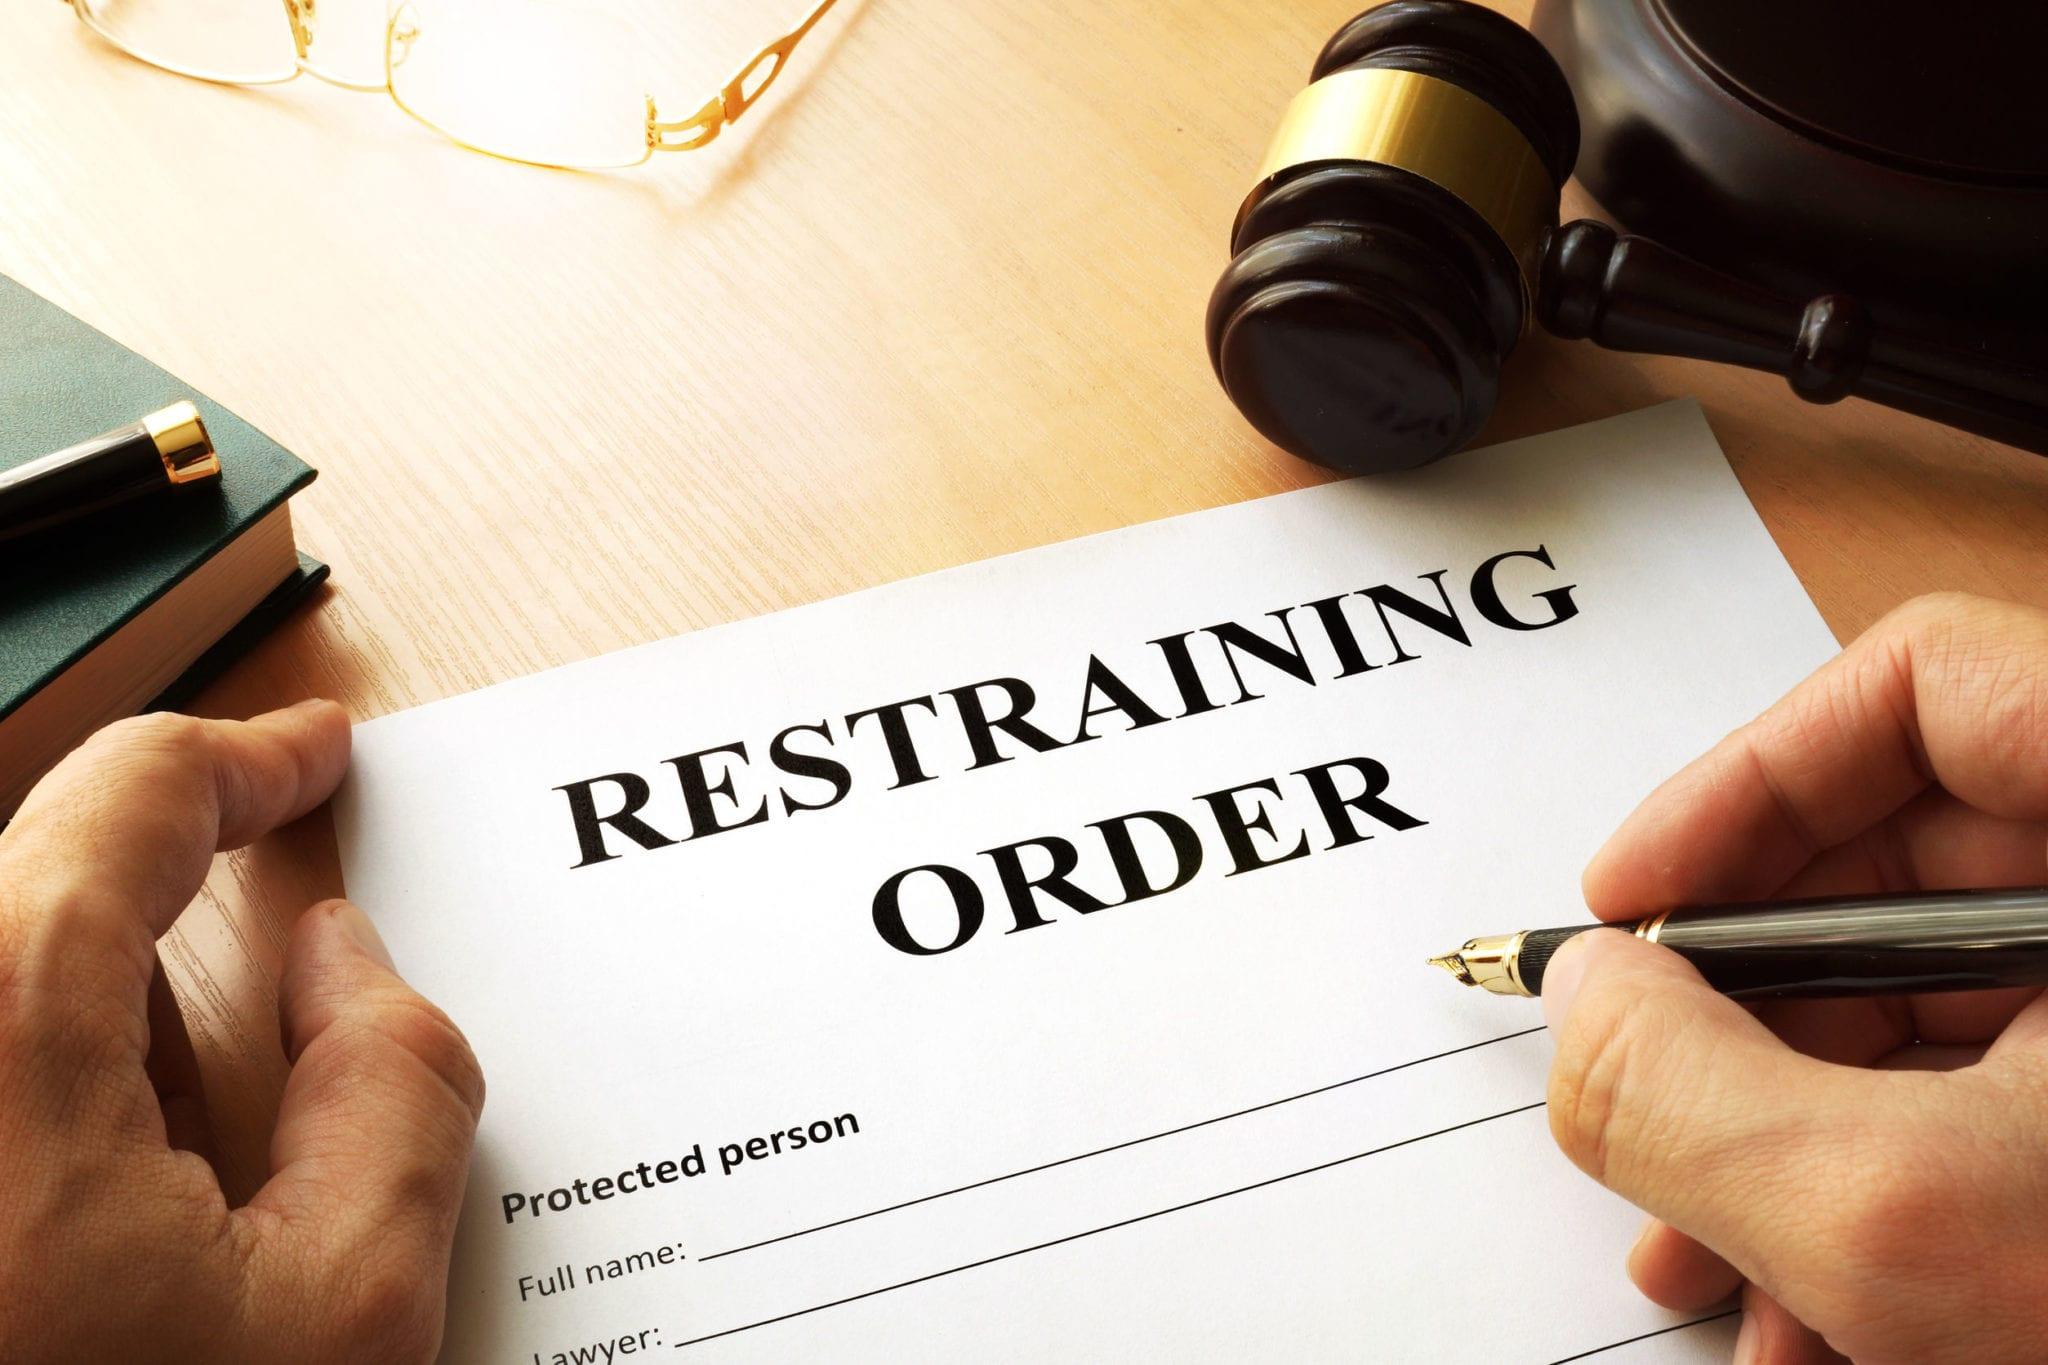 Orders Law Restraining Enforcement